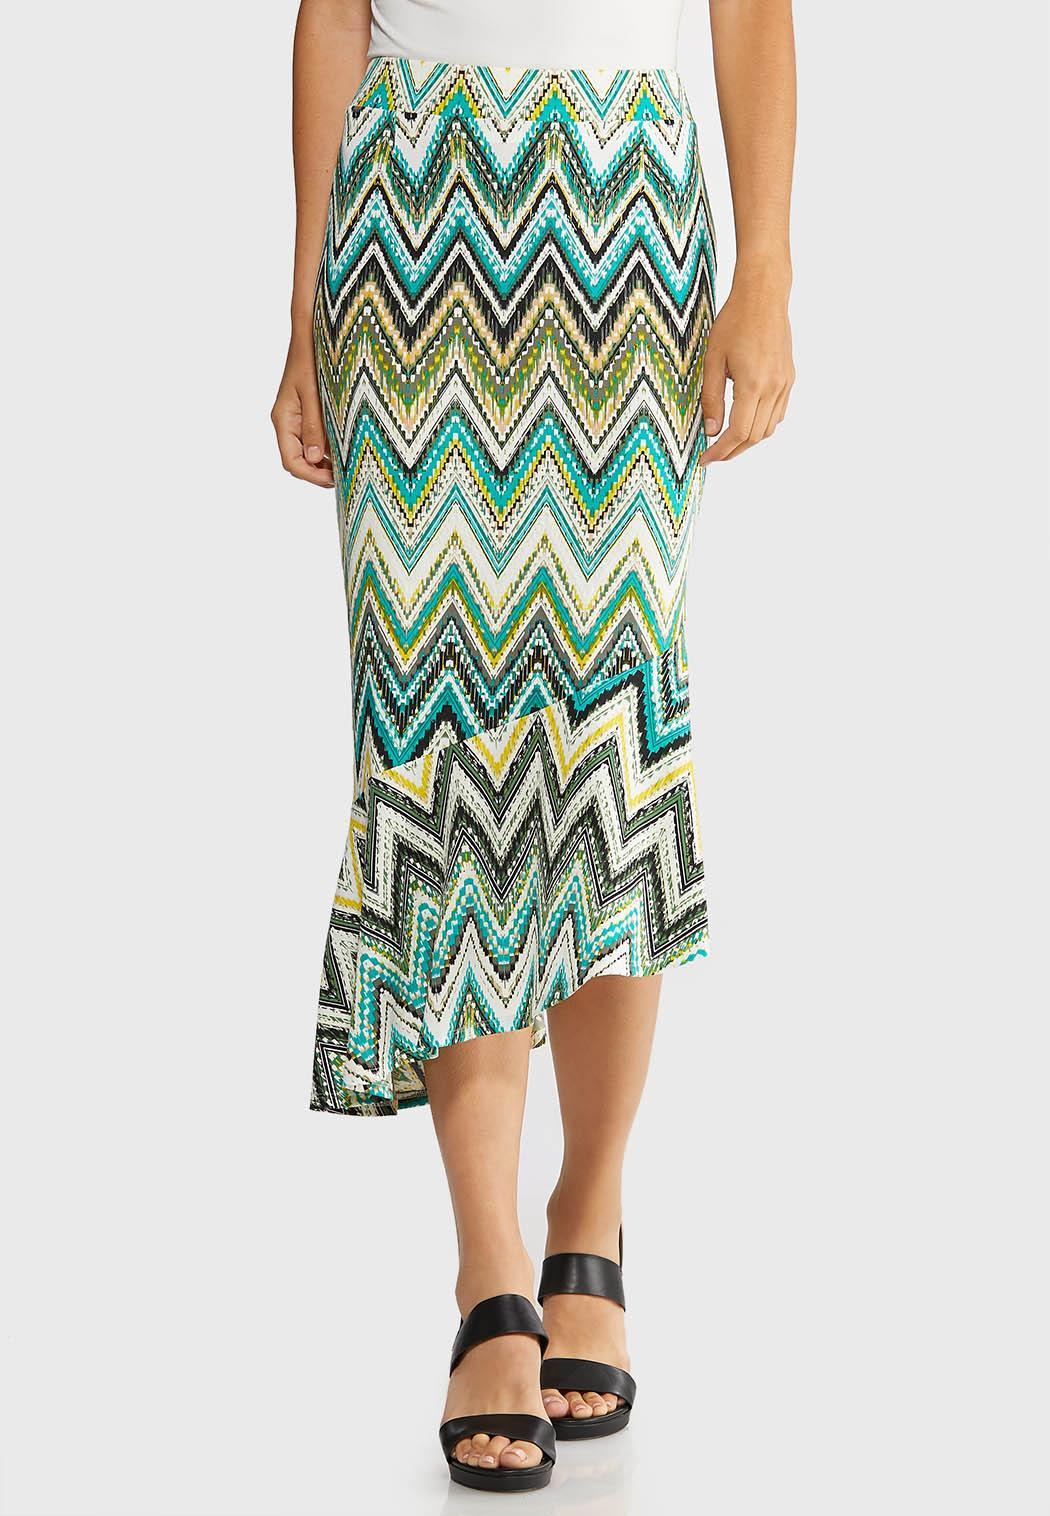 Plus Size Asymmetrical Chevron Skirt